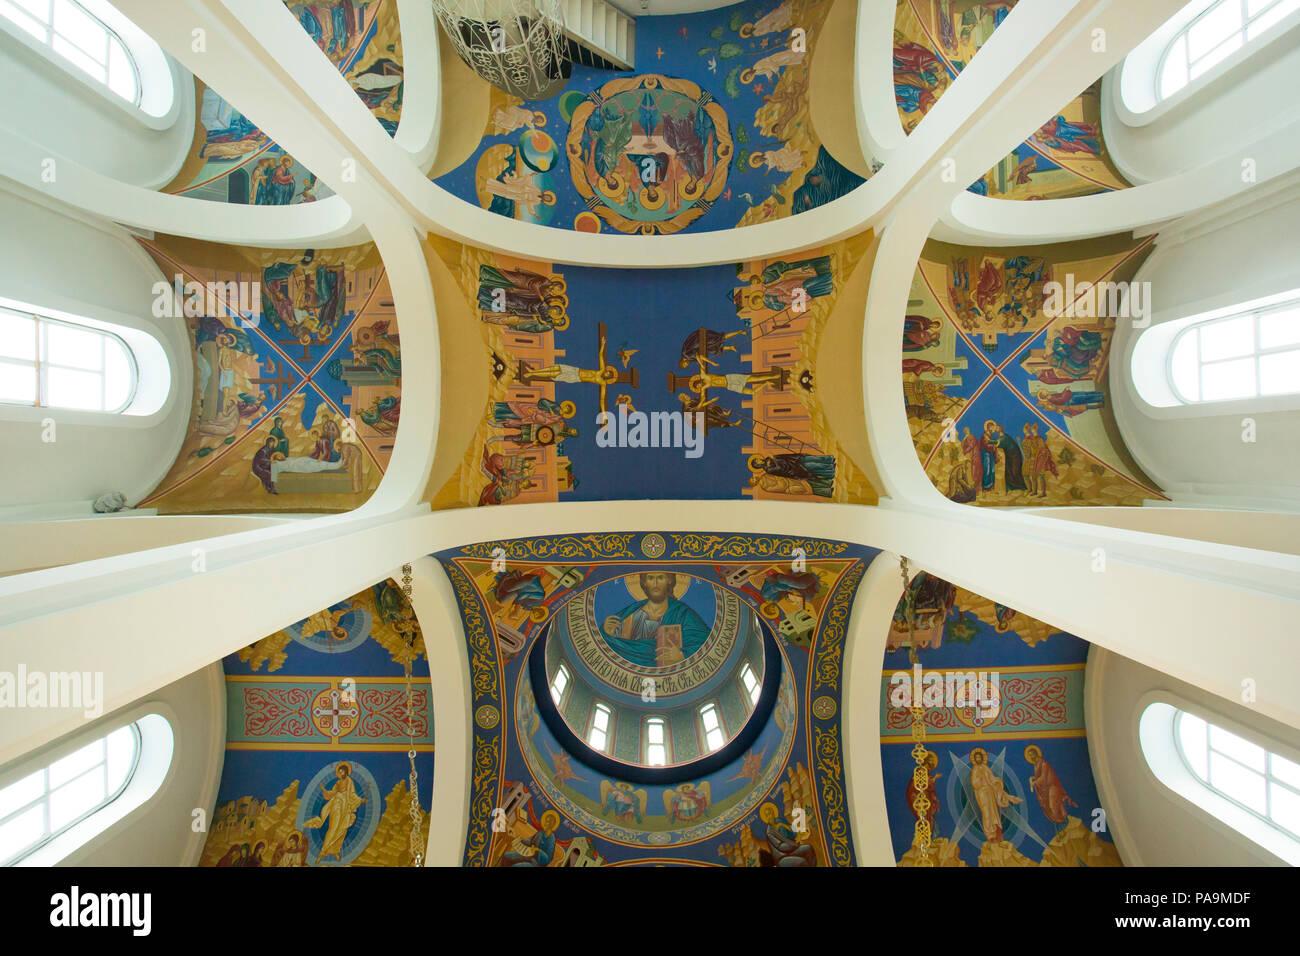 Trinity Cathedral Interior - Petropavlovsk-kamchatsky, Russia - Stock Image